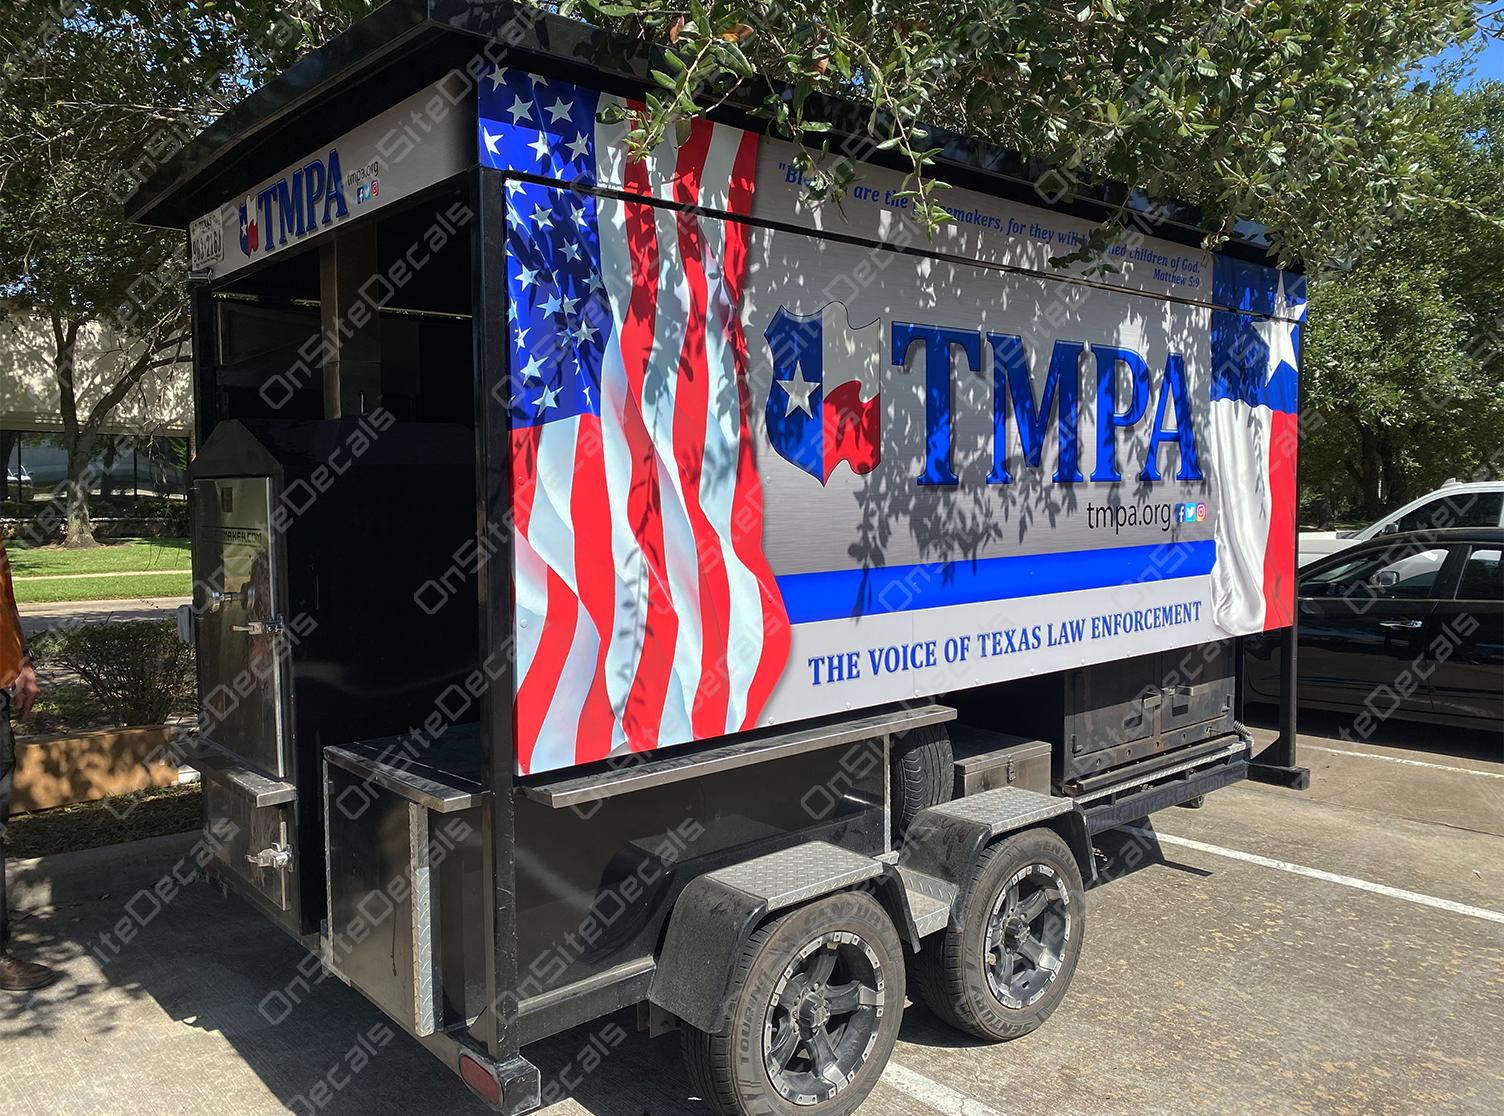 tmpa-trailer.png